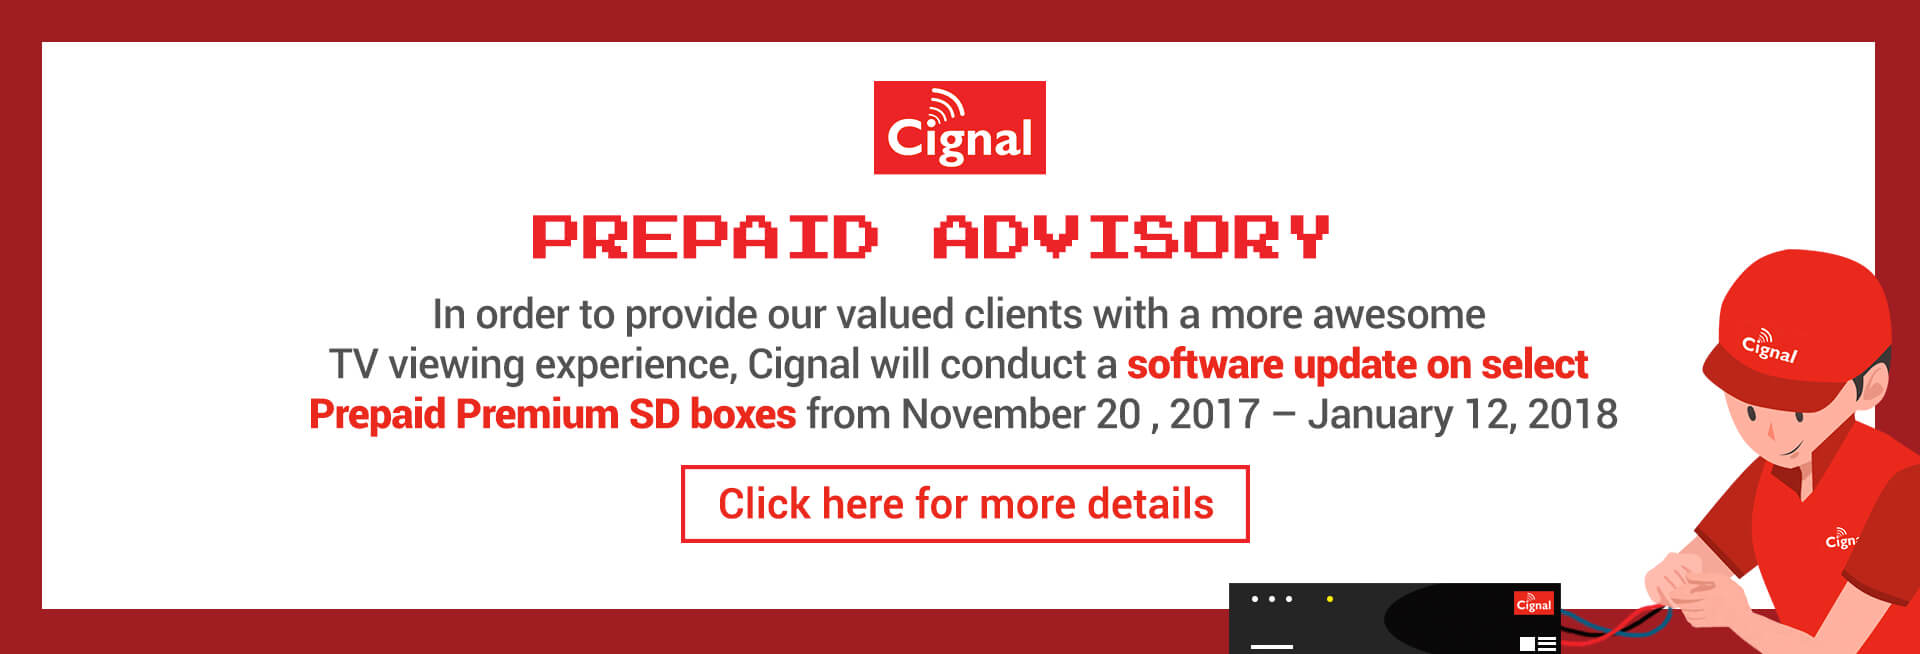 Prepaid Premium SD Box Software Update